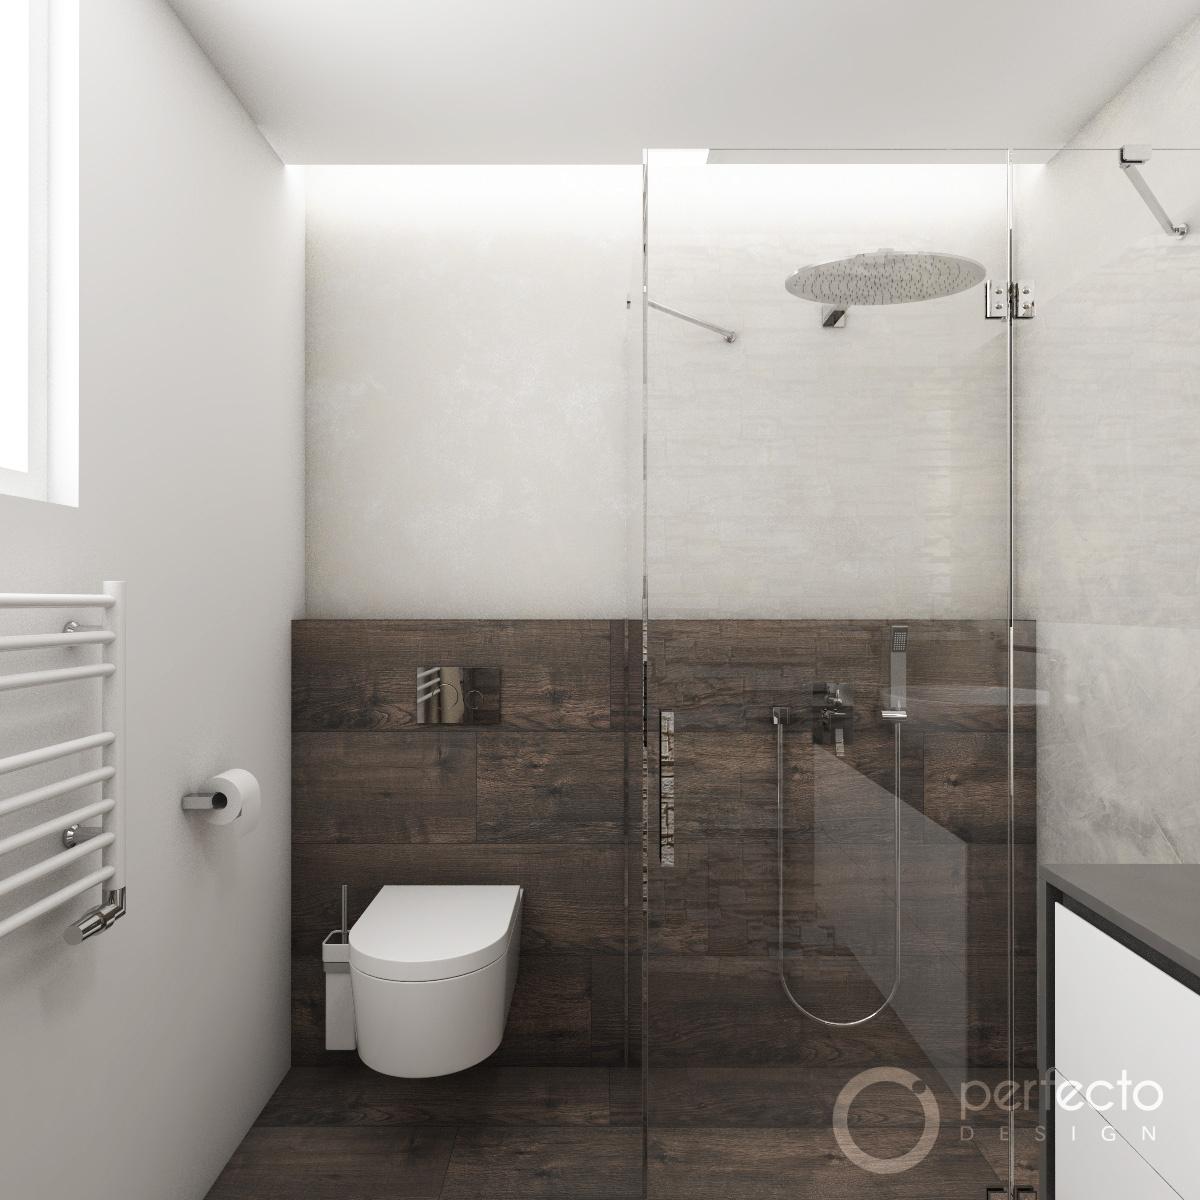 natur-badezimmer stone | perfecto design, Badezimmer